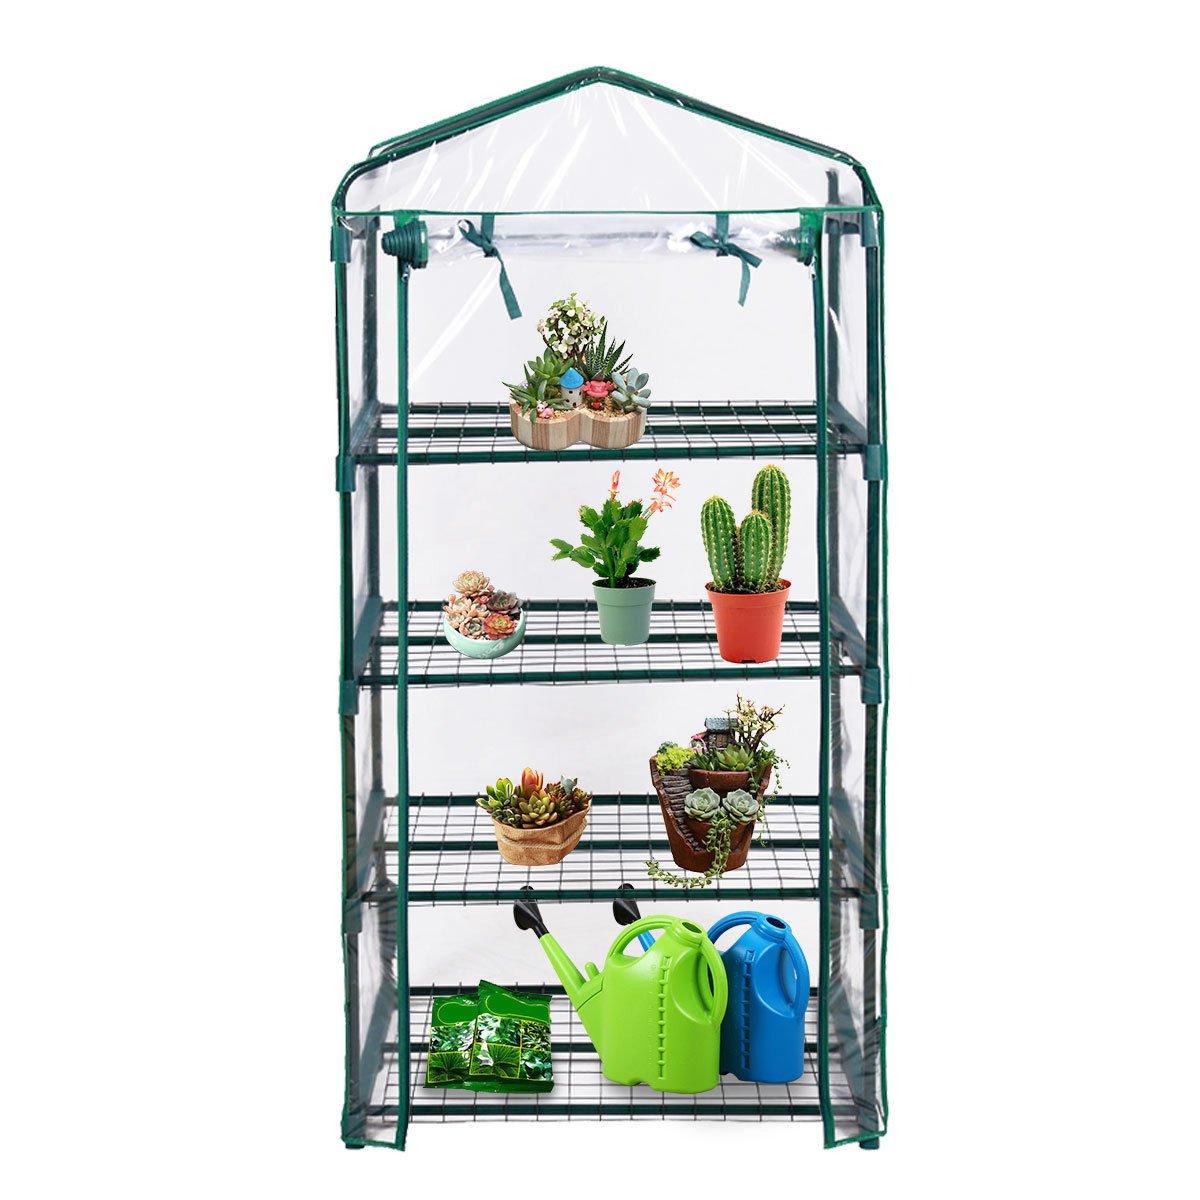 Super buy 4 Shelves Greenhouse Portable Mini Outdoor Green House Brand New Garden